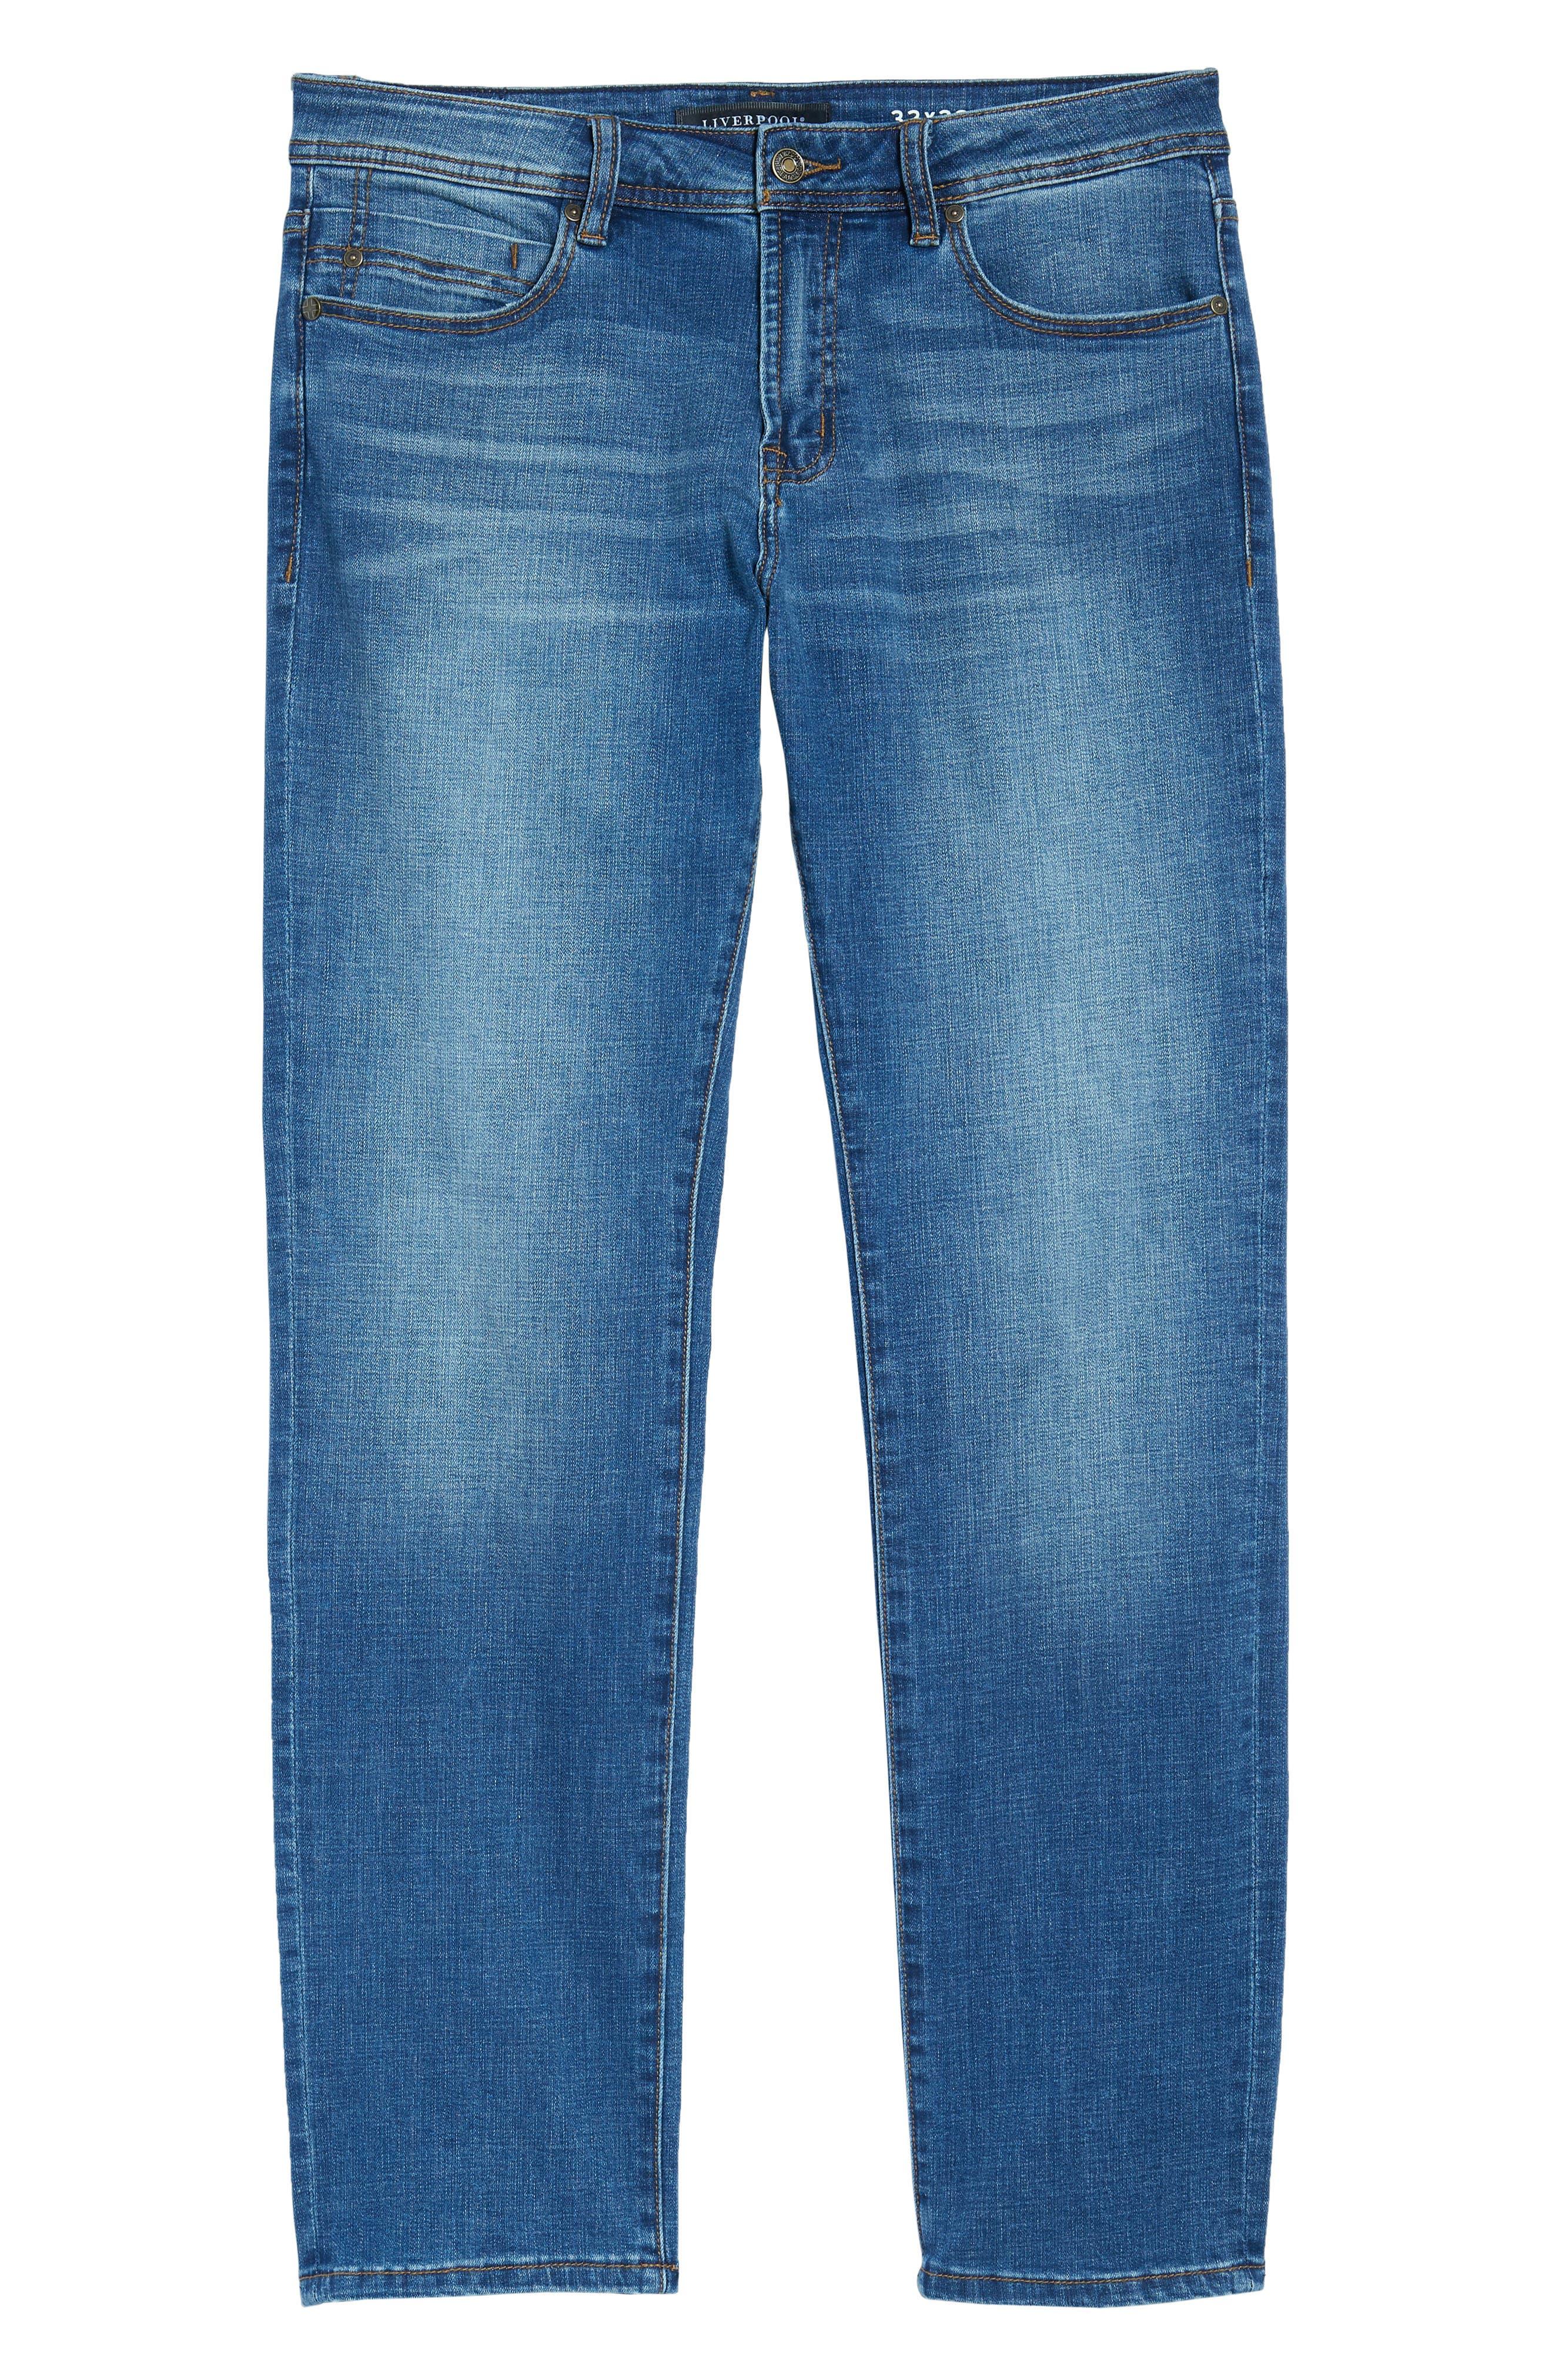 Jeans Co. Regent Relaxed Straight Leg Jeans,                             Alternate thumbnail 6, color,                             402